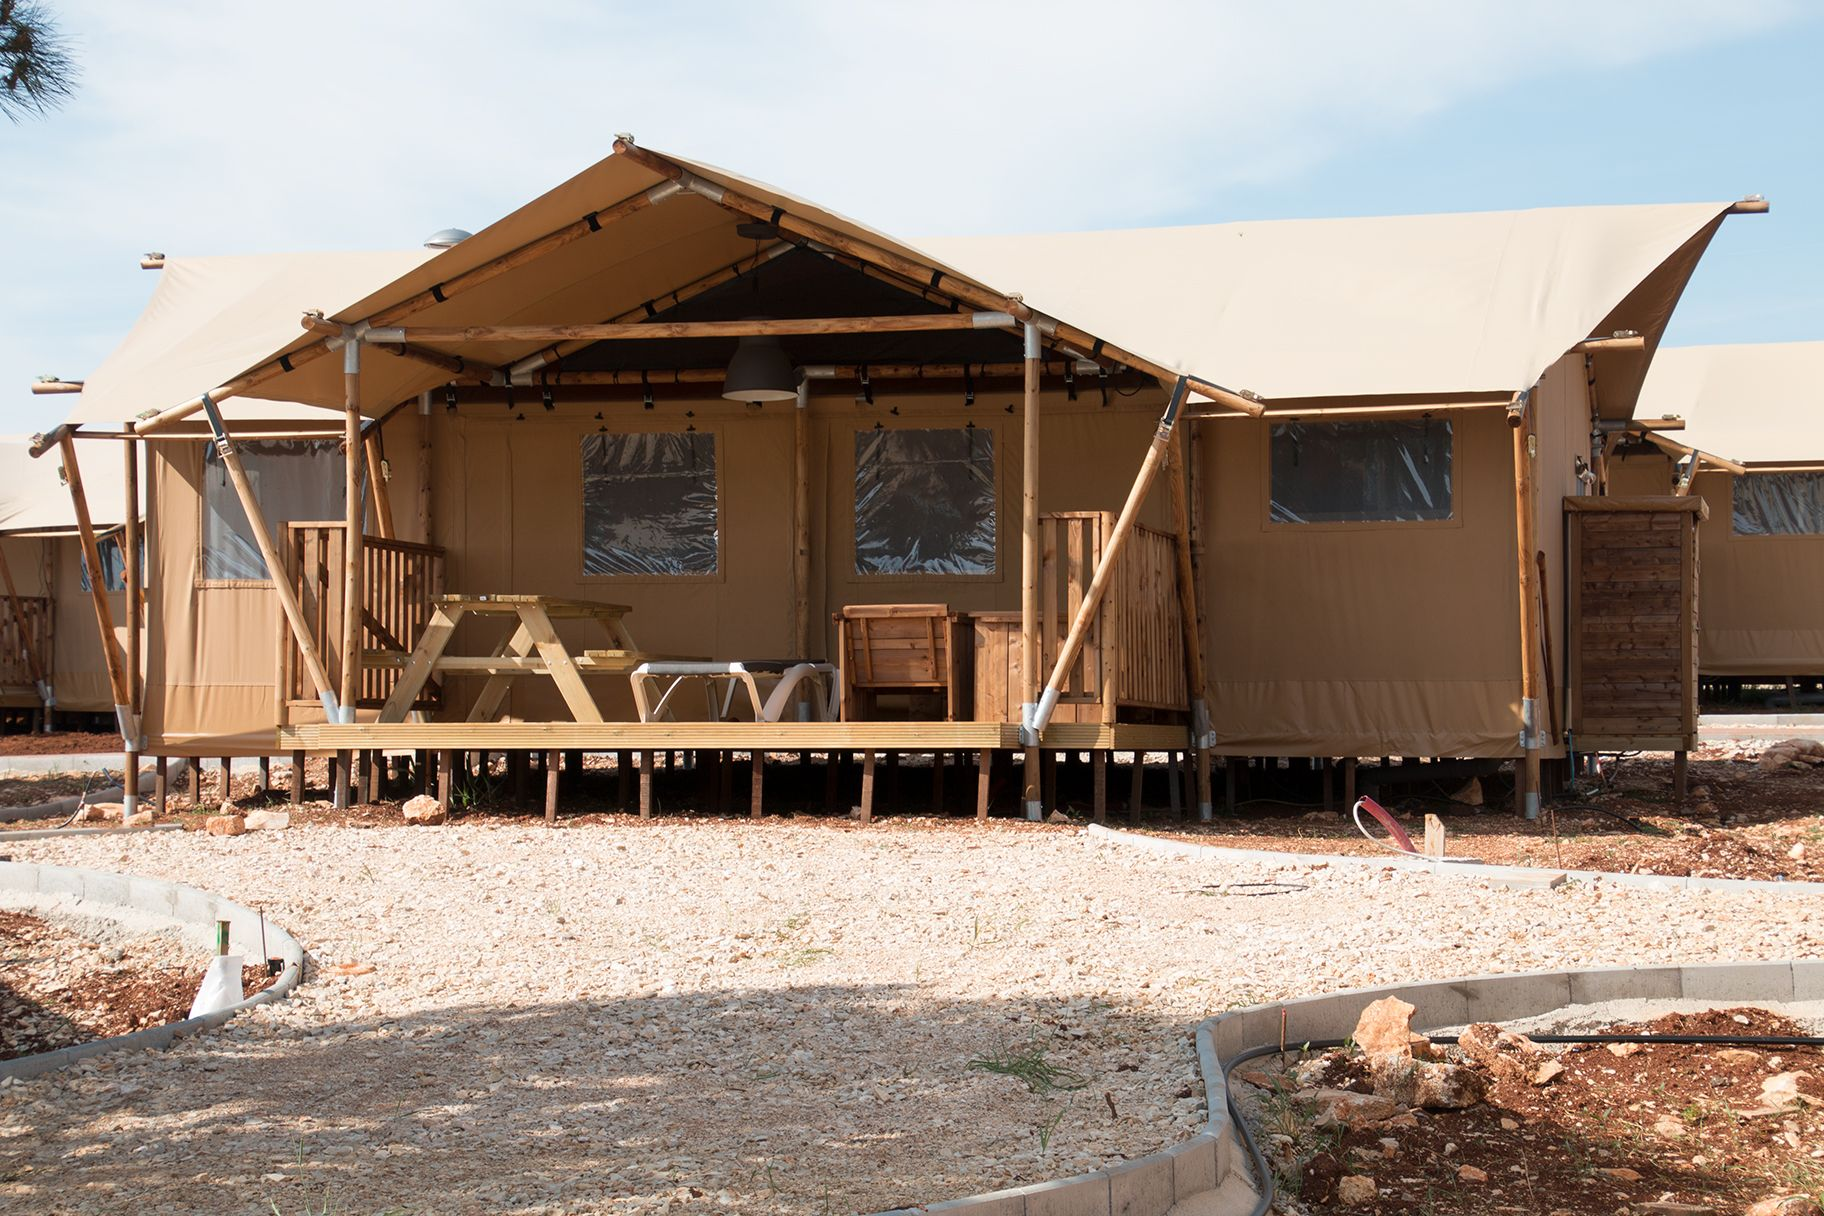 Luxury Lodge Camping Umag Kroatie Glamping, Vakantie, Tent